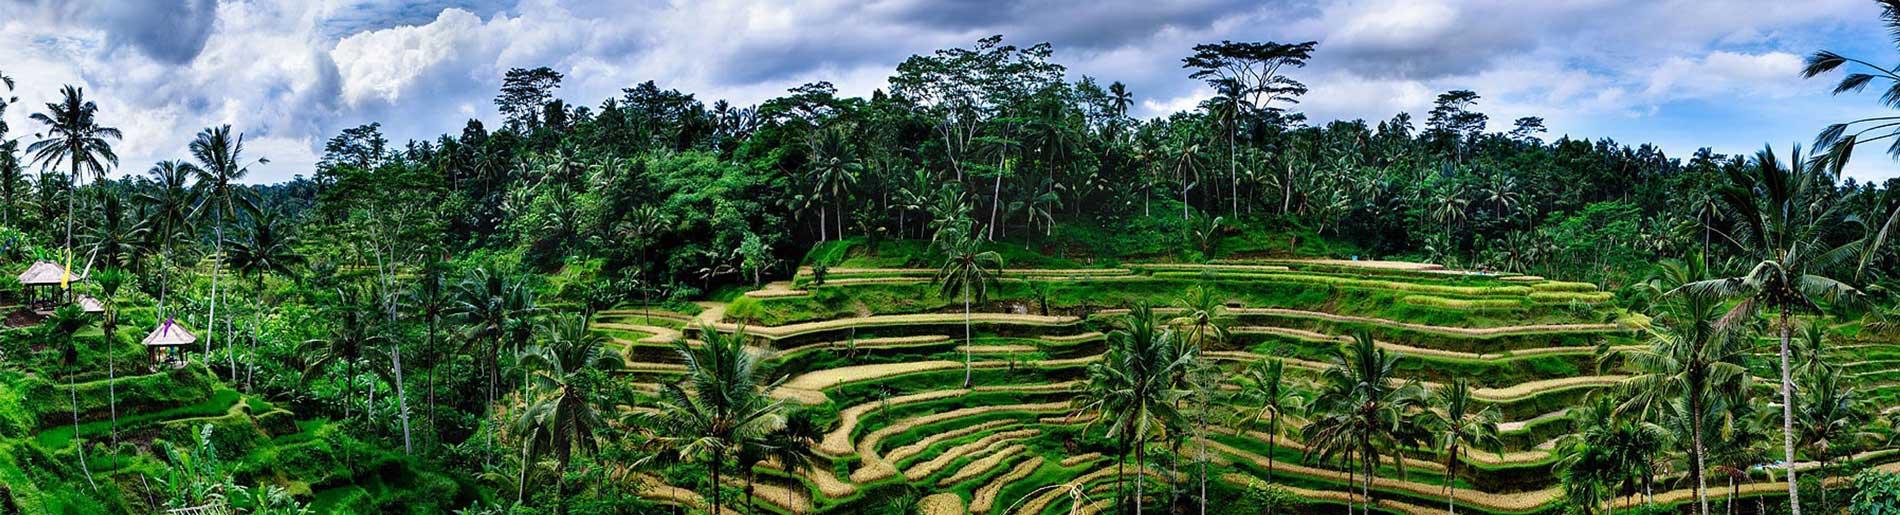 DEVINUS-reizen-rijstvelden-Tegalalang PANO